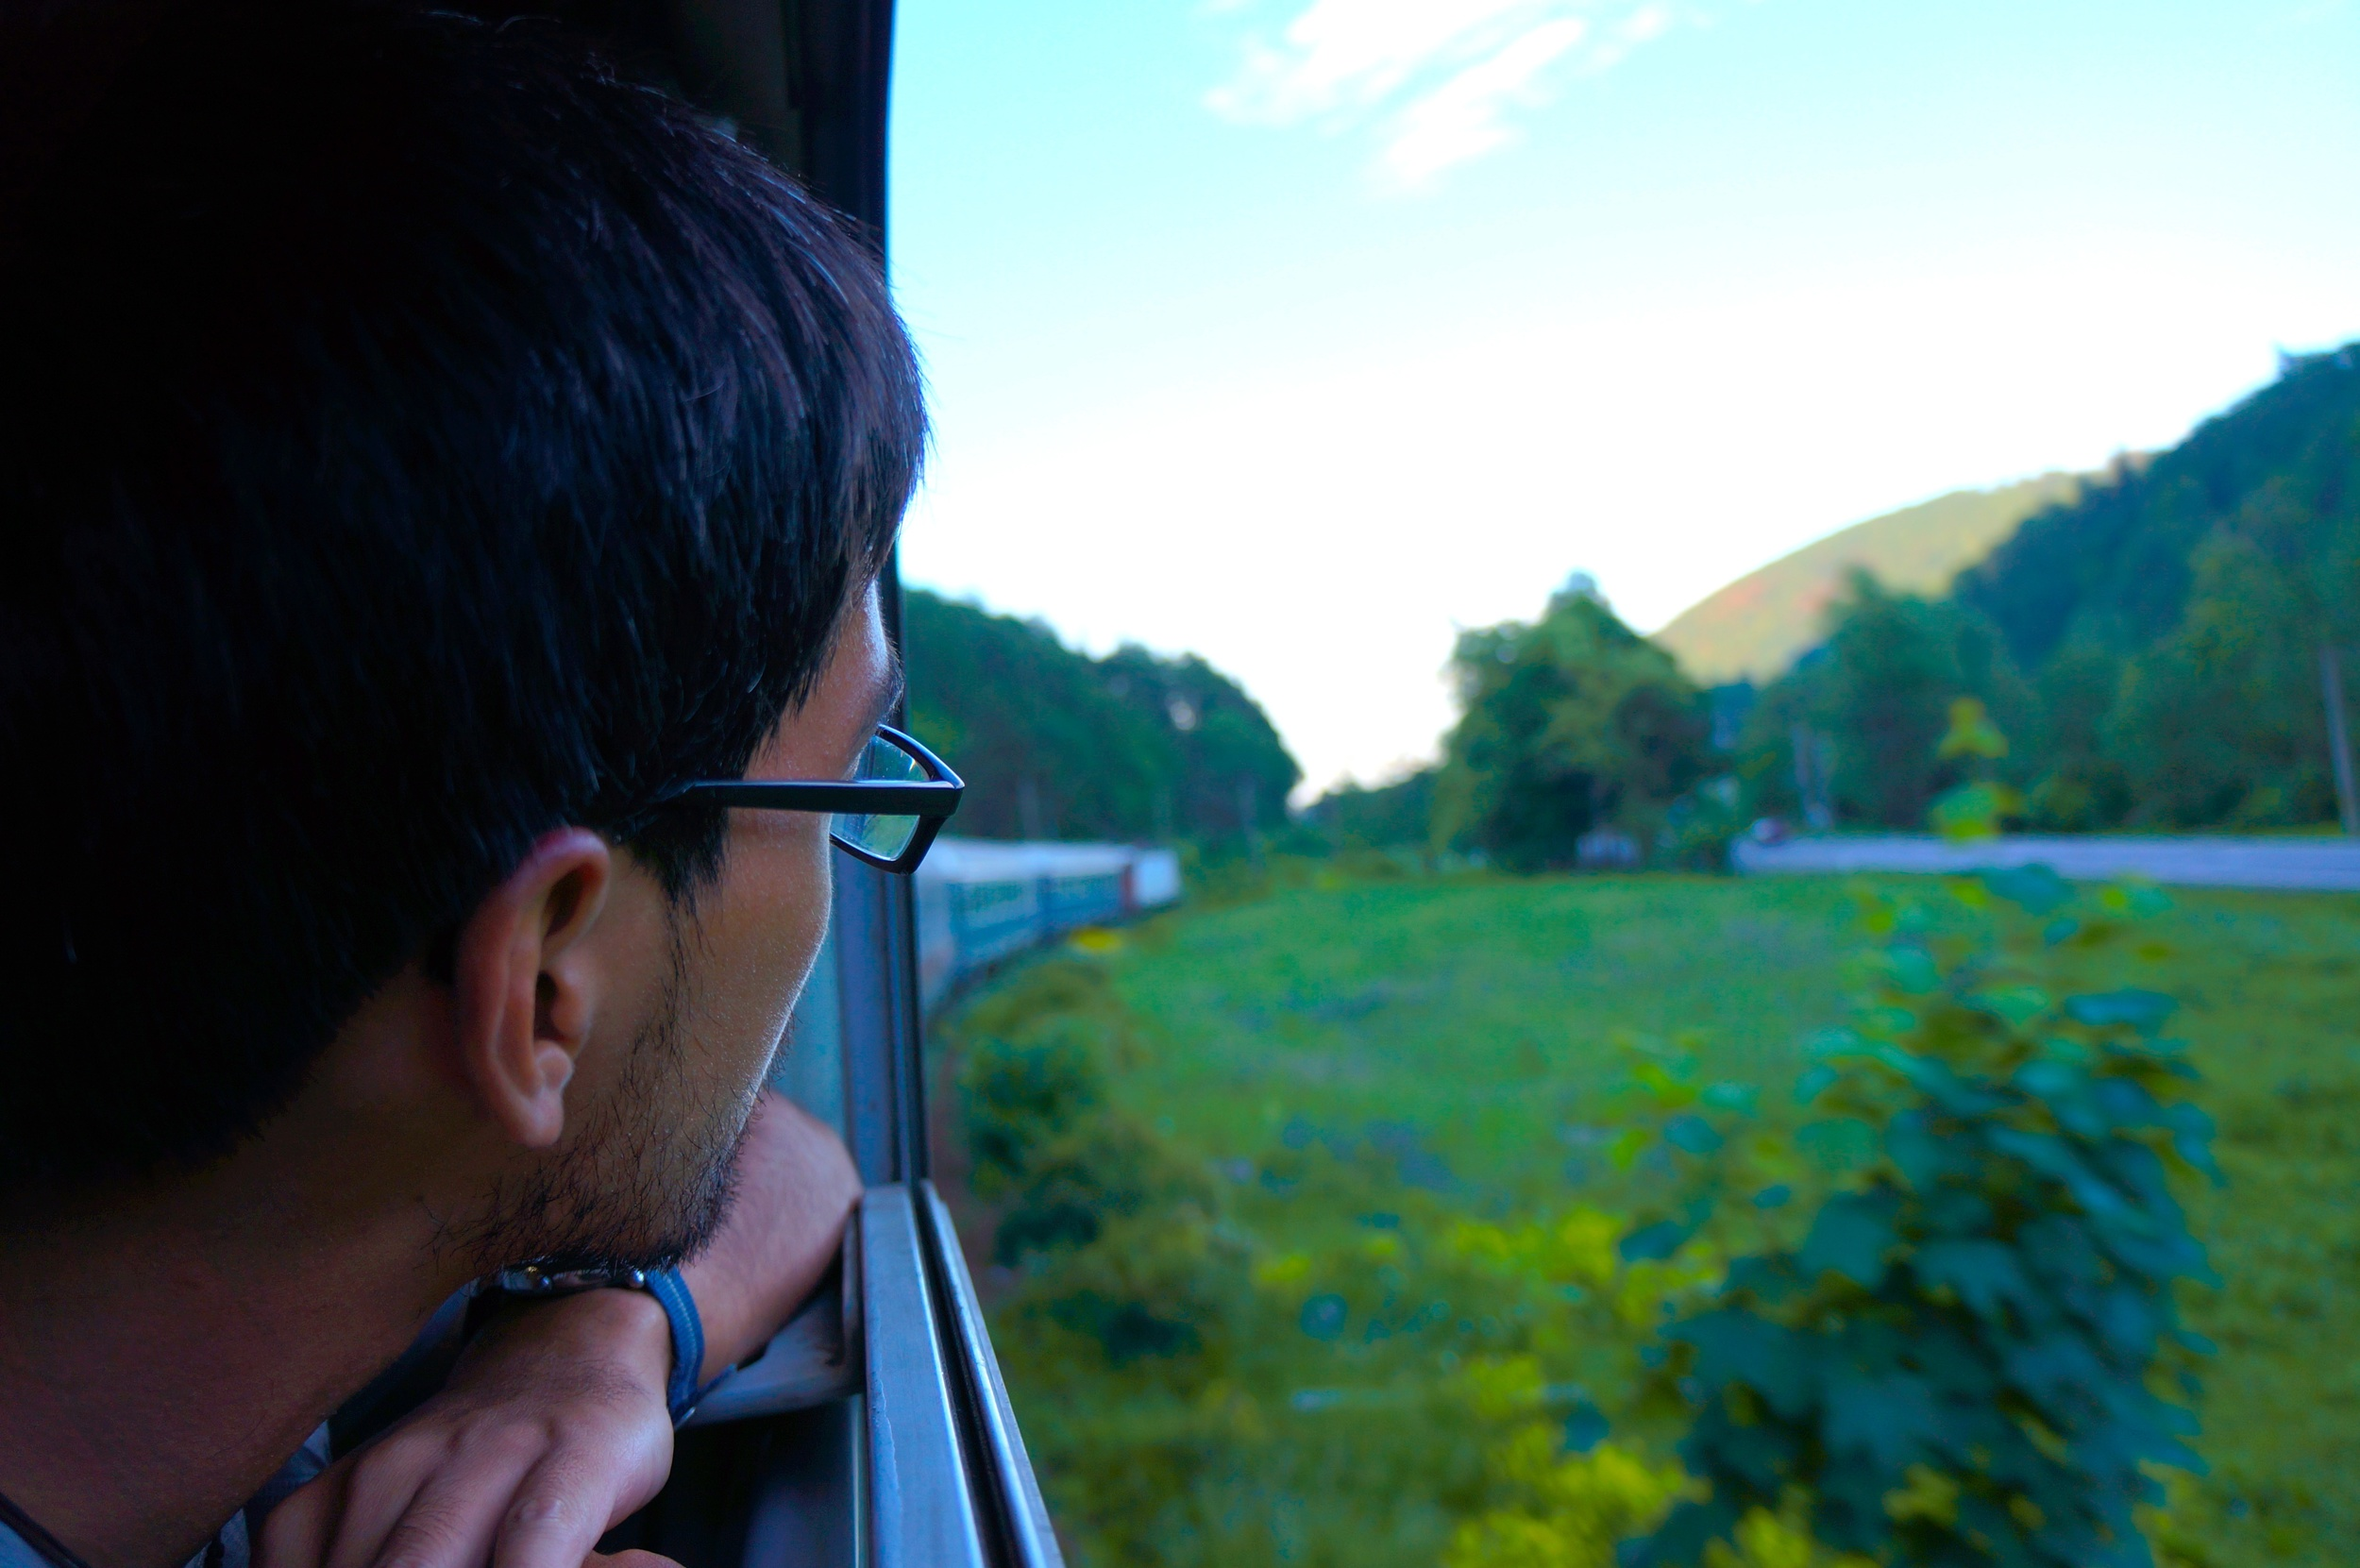 Travel Days Ahead